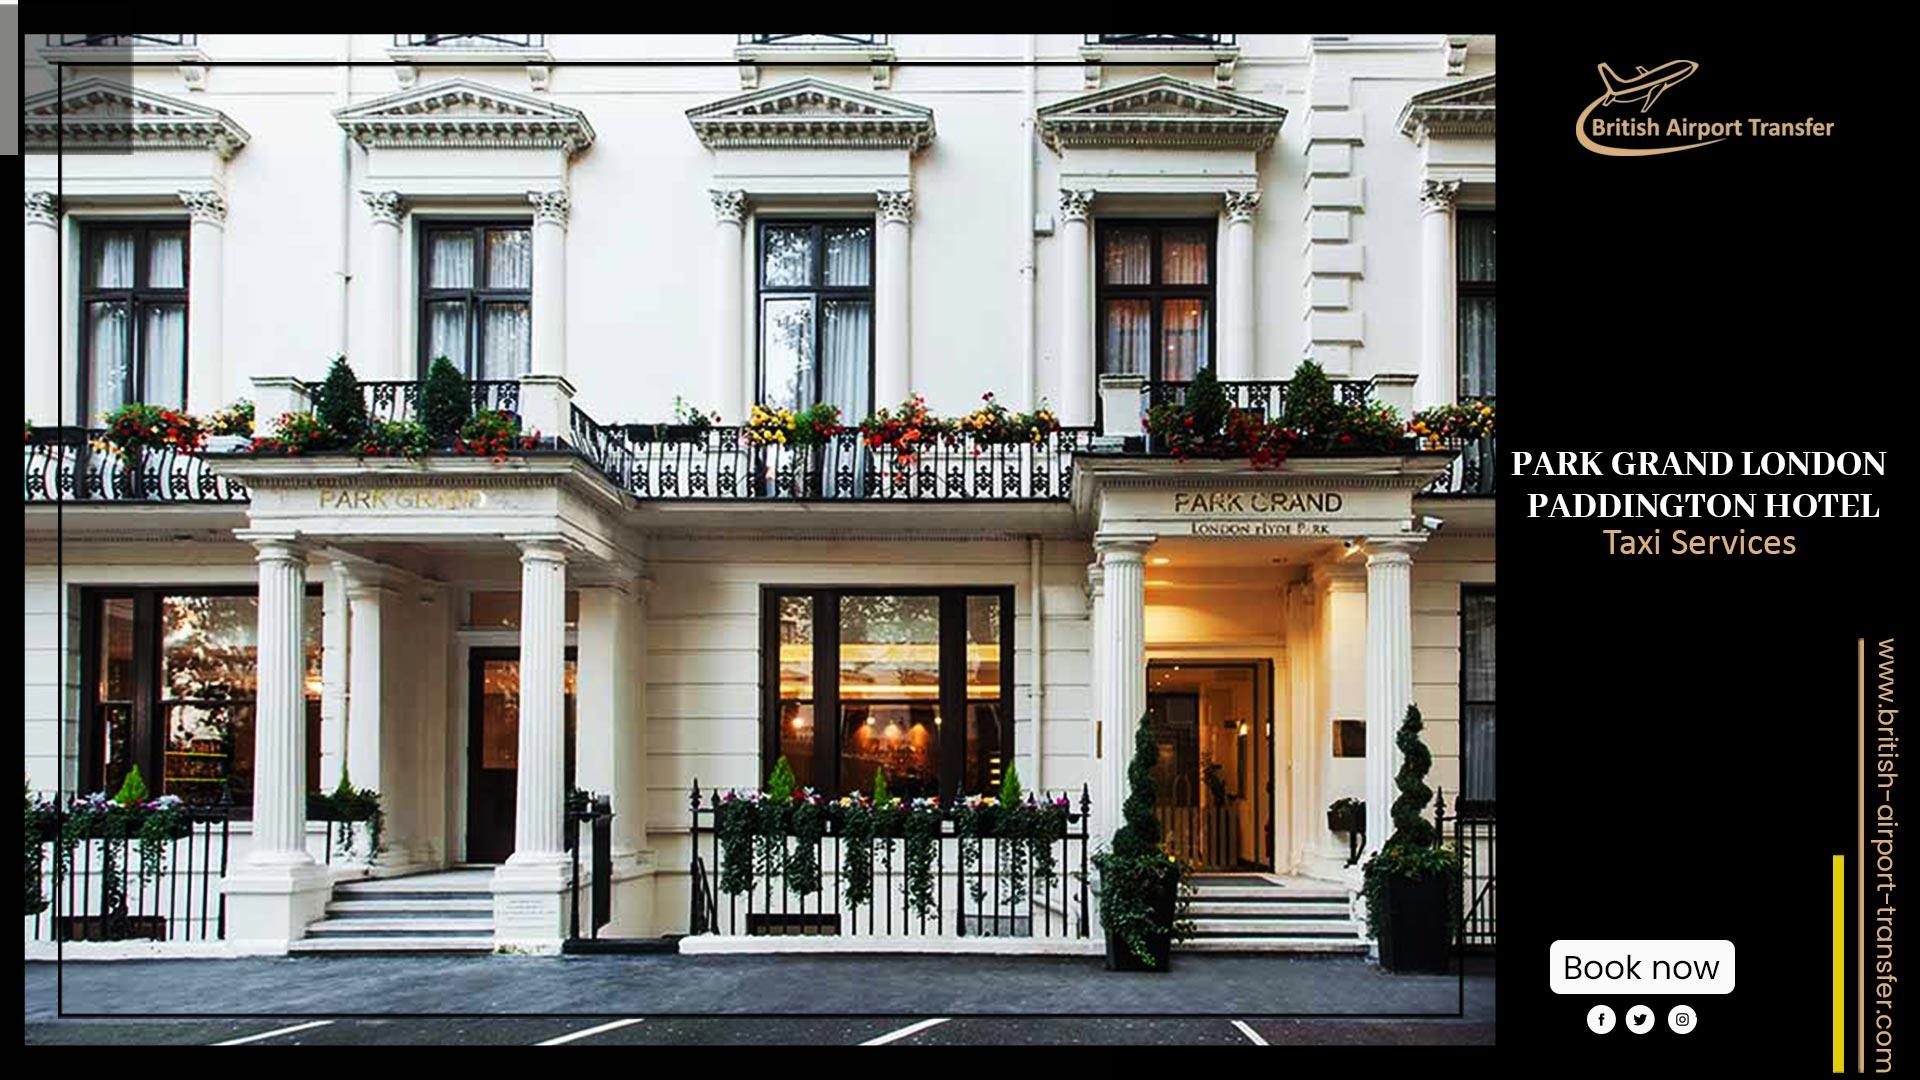 Taxi Cab – Park Grand London Paddington Hotel / W2 3BA